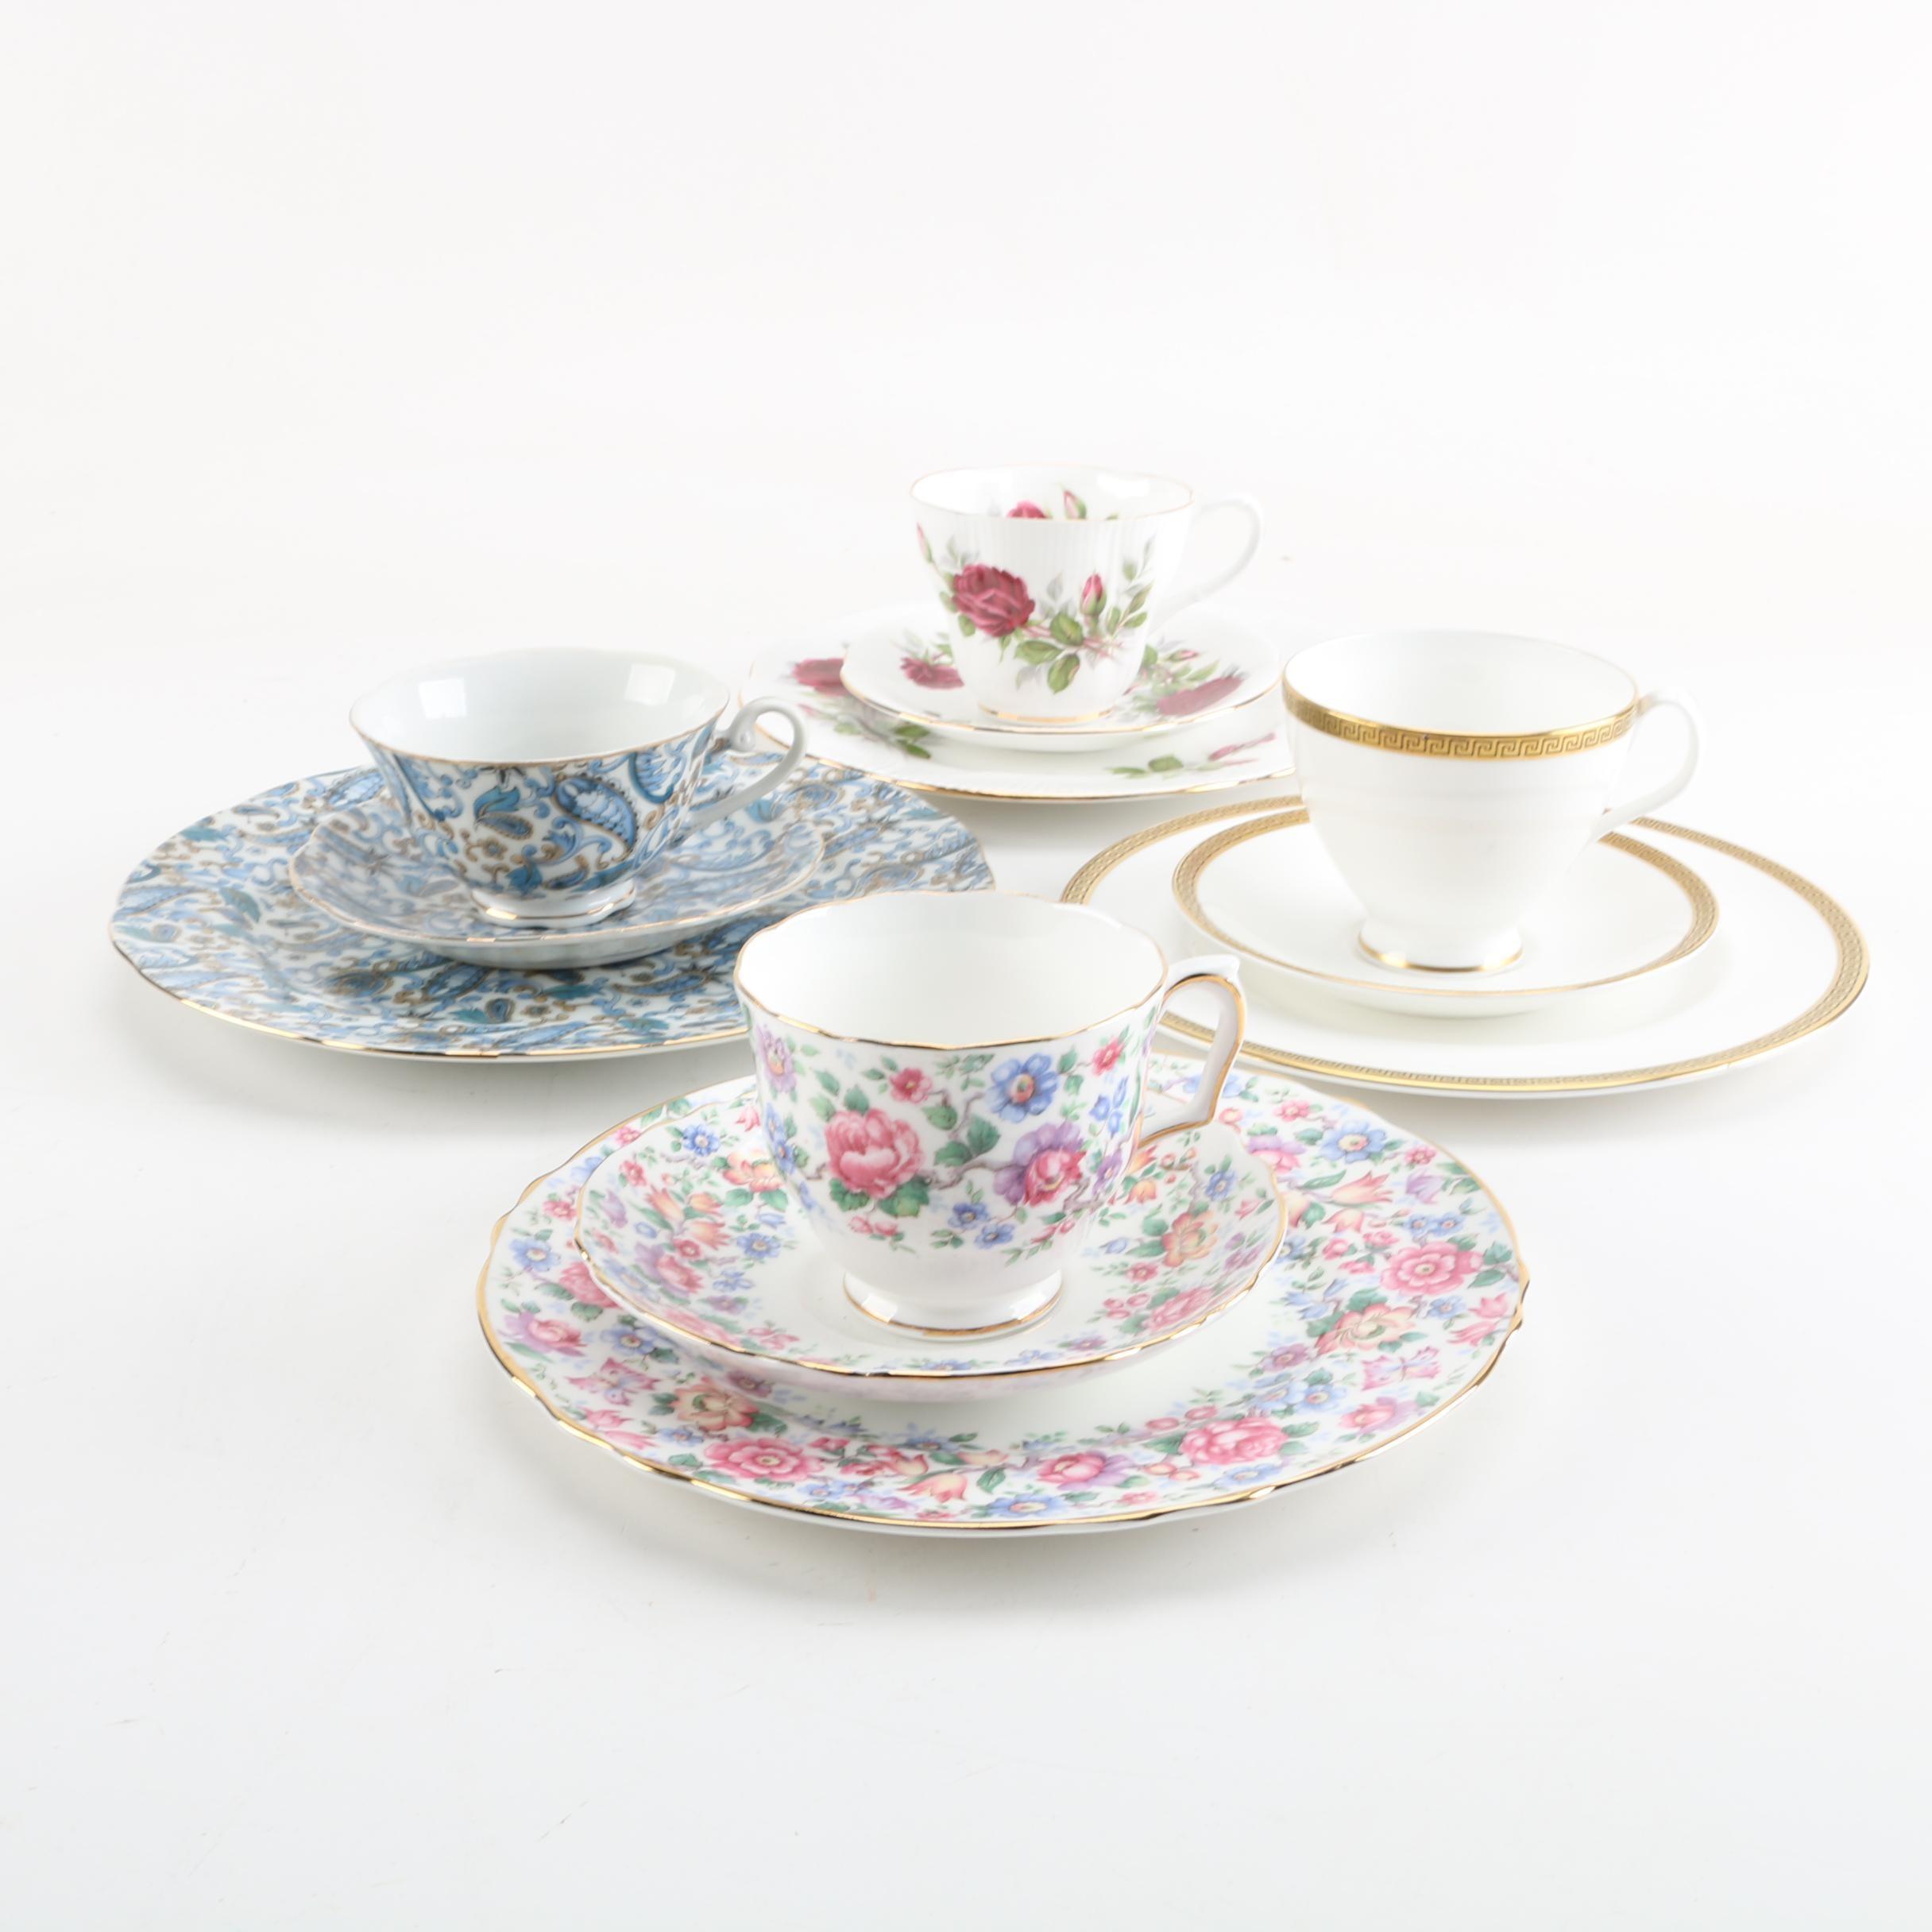 Tea Service Place Settings Featuring Royal Albert